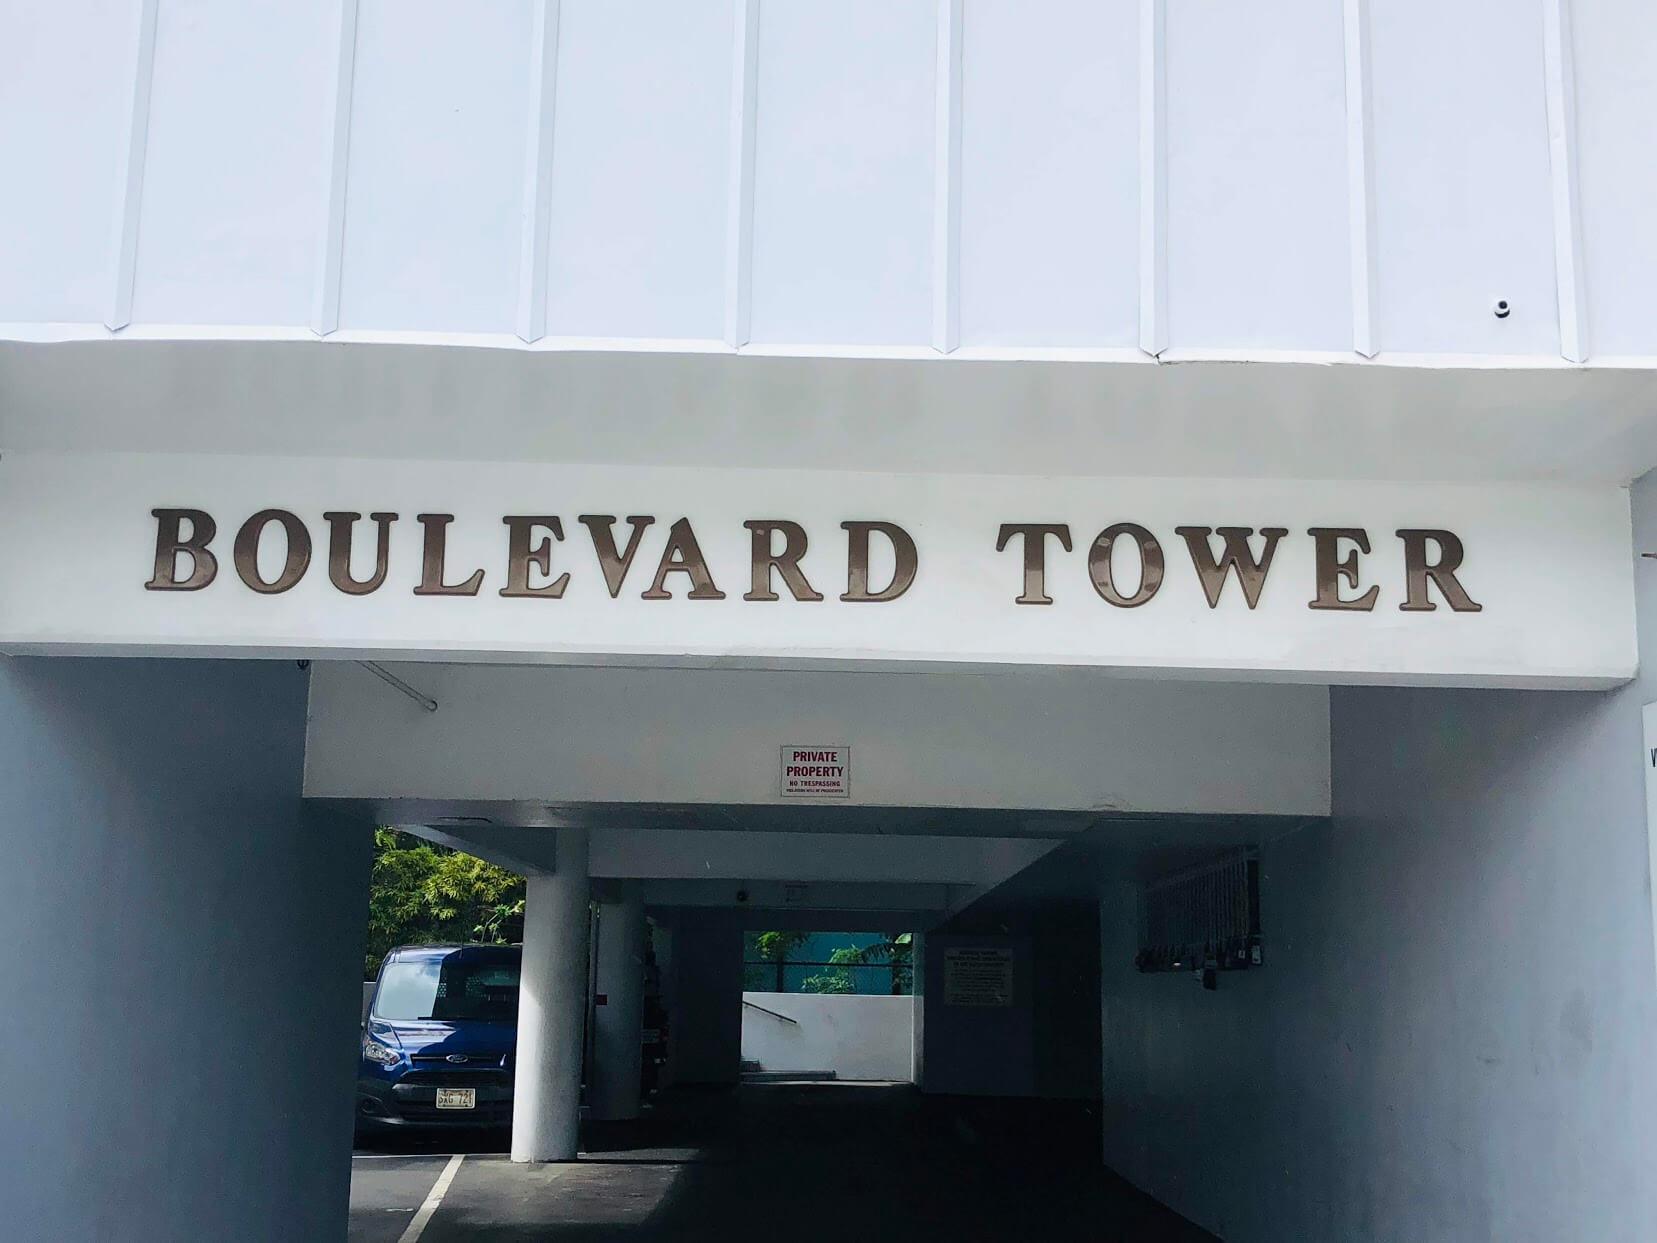 Boulevard Towermの看板